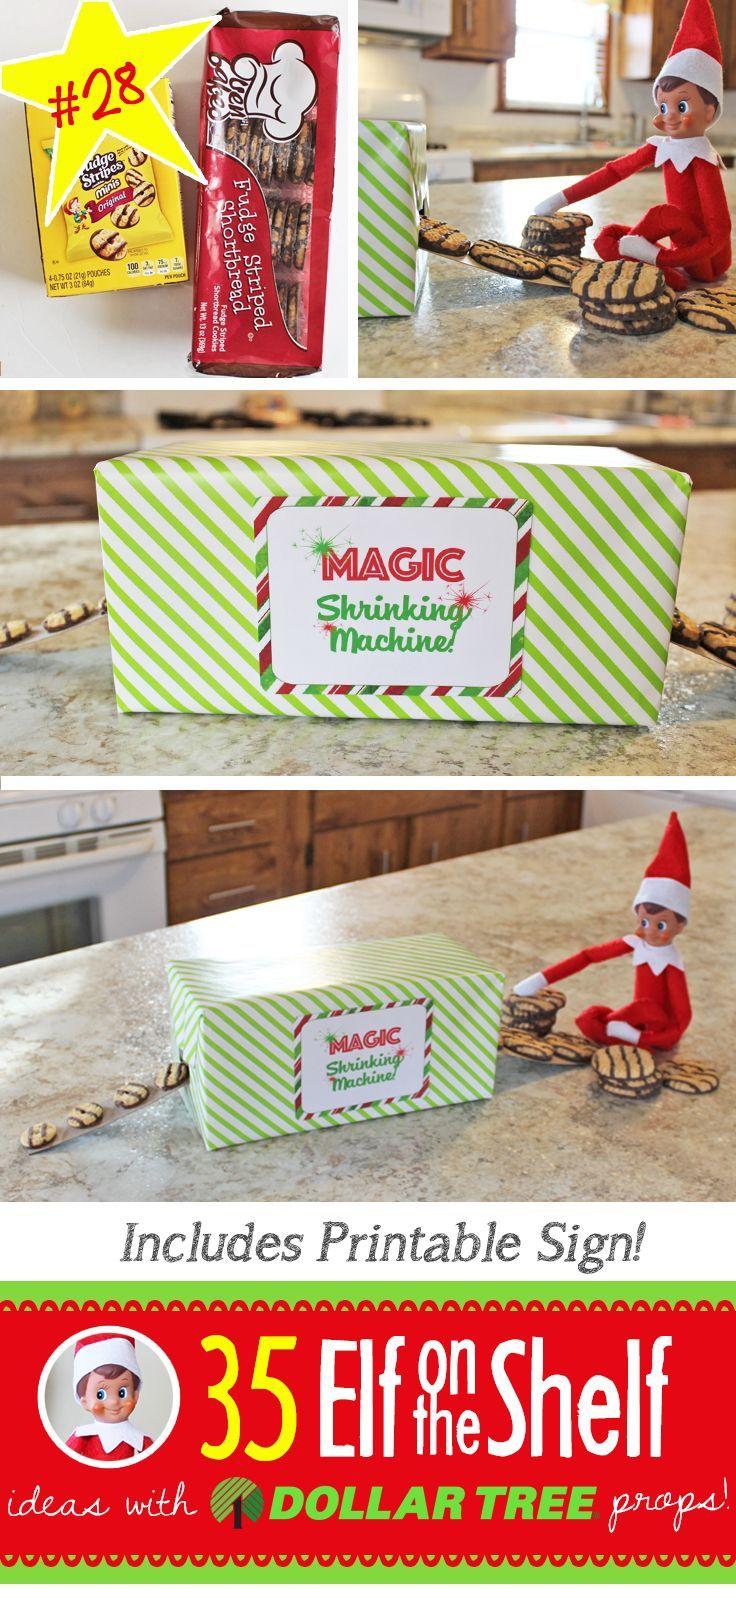 55+ New Elf on the Shelf Ideas: #28 Magic Shrinking Machine #easyelfontheshelfideaslastminute